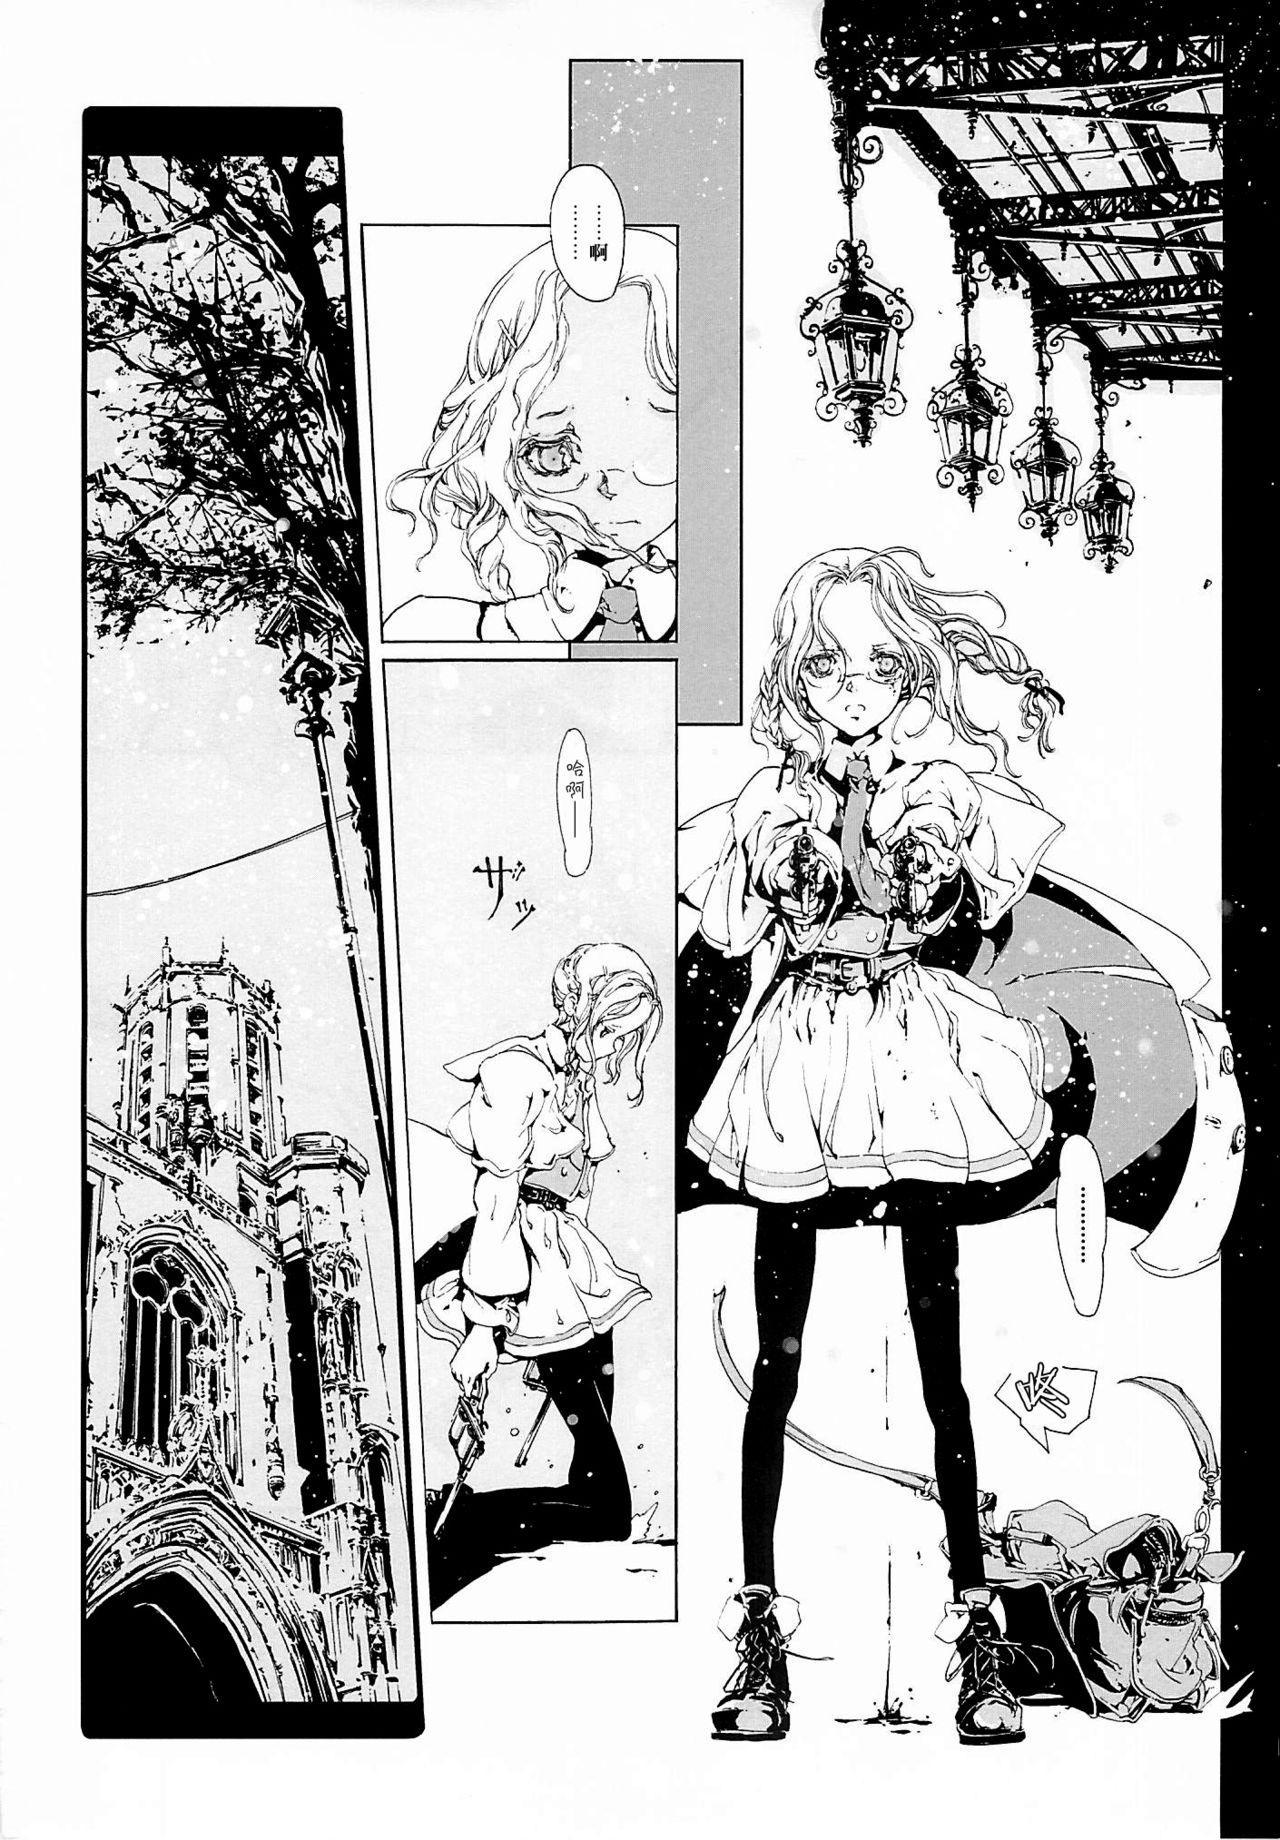 (CR37) [70 Nenshiki Yuukyuu Kikan (Endou Okito)] ORGAN-Tino  01-02[Chinese] [拾荒者汉化组] [Incomplete] 54